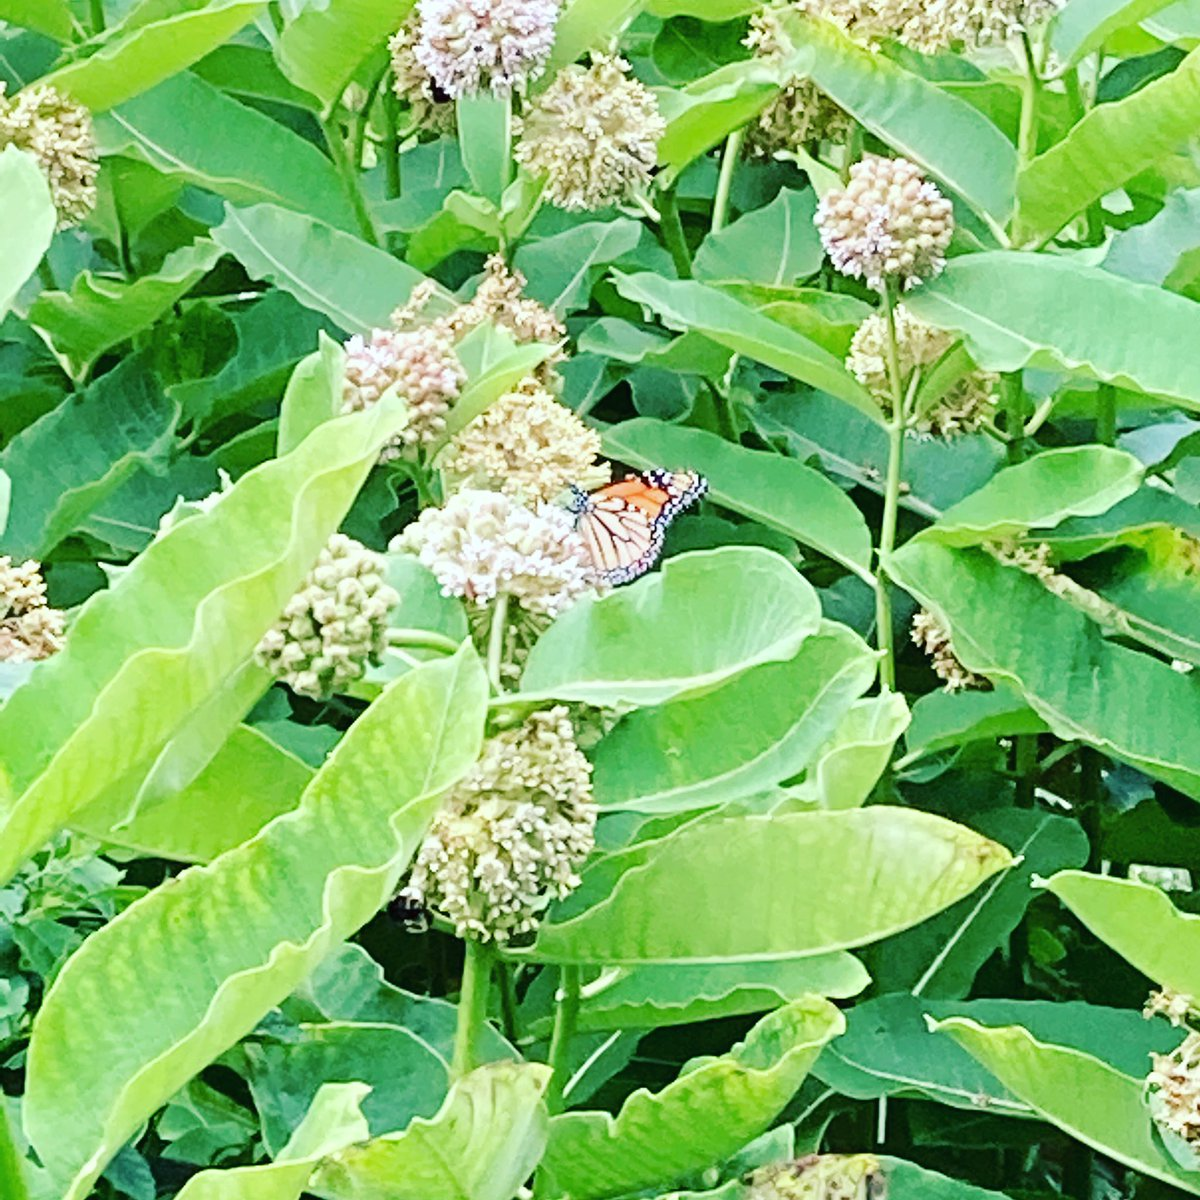 First monarch of the season in my garden! @BCPSOutdoorSci